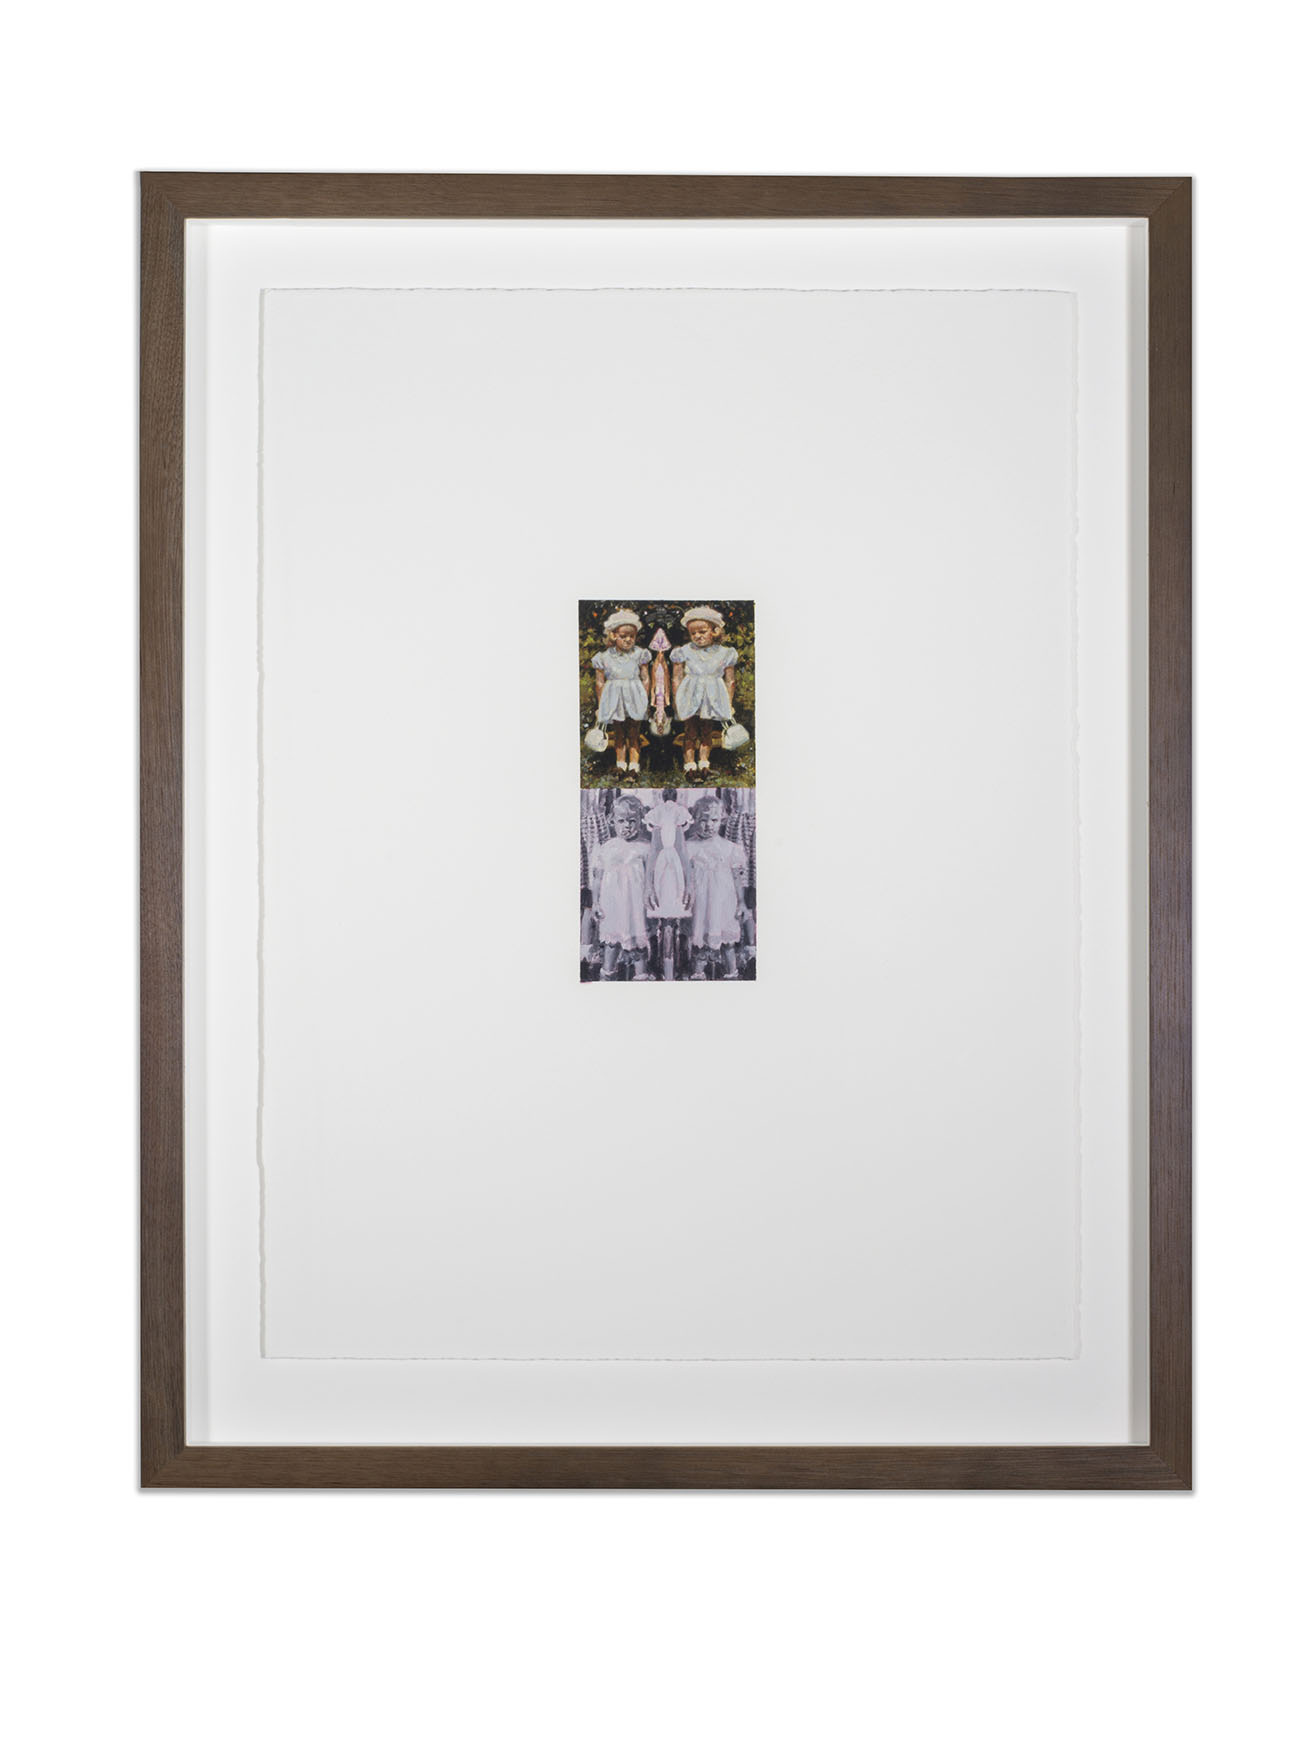 Copy of HSP Response (Susan Frances Skelton), oil on paper, 50 x 38 cm, (image 18 x 8 cm), 2016. (Private Collection).